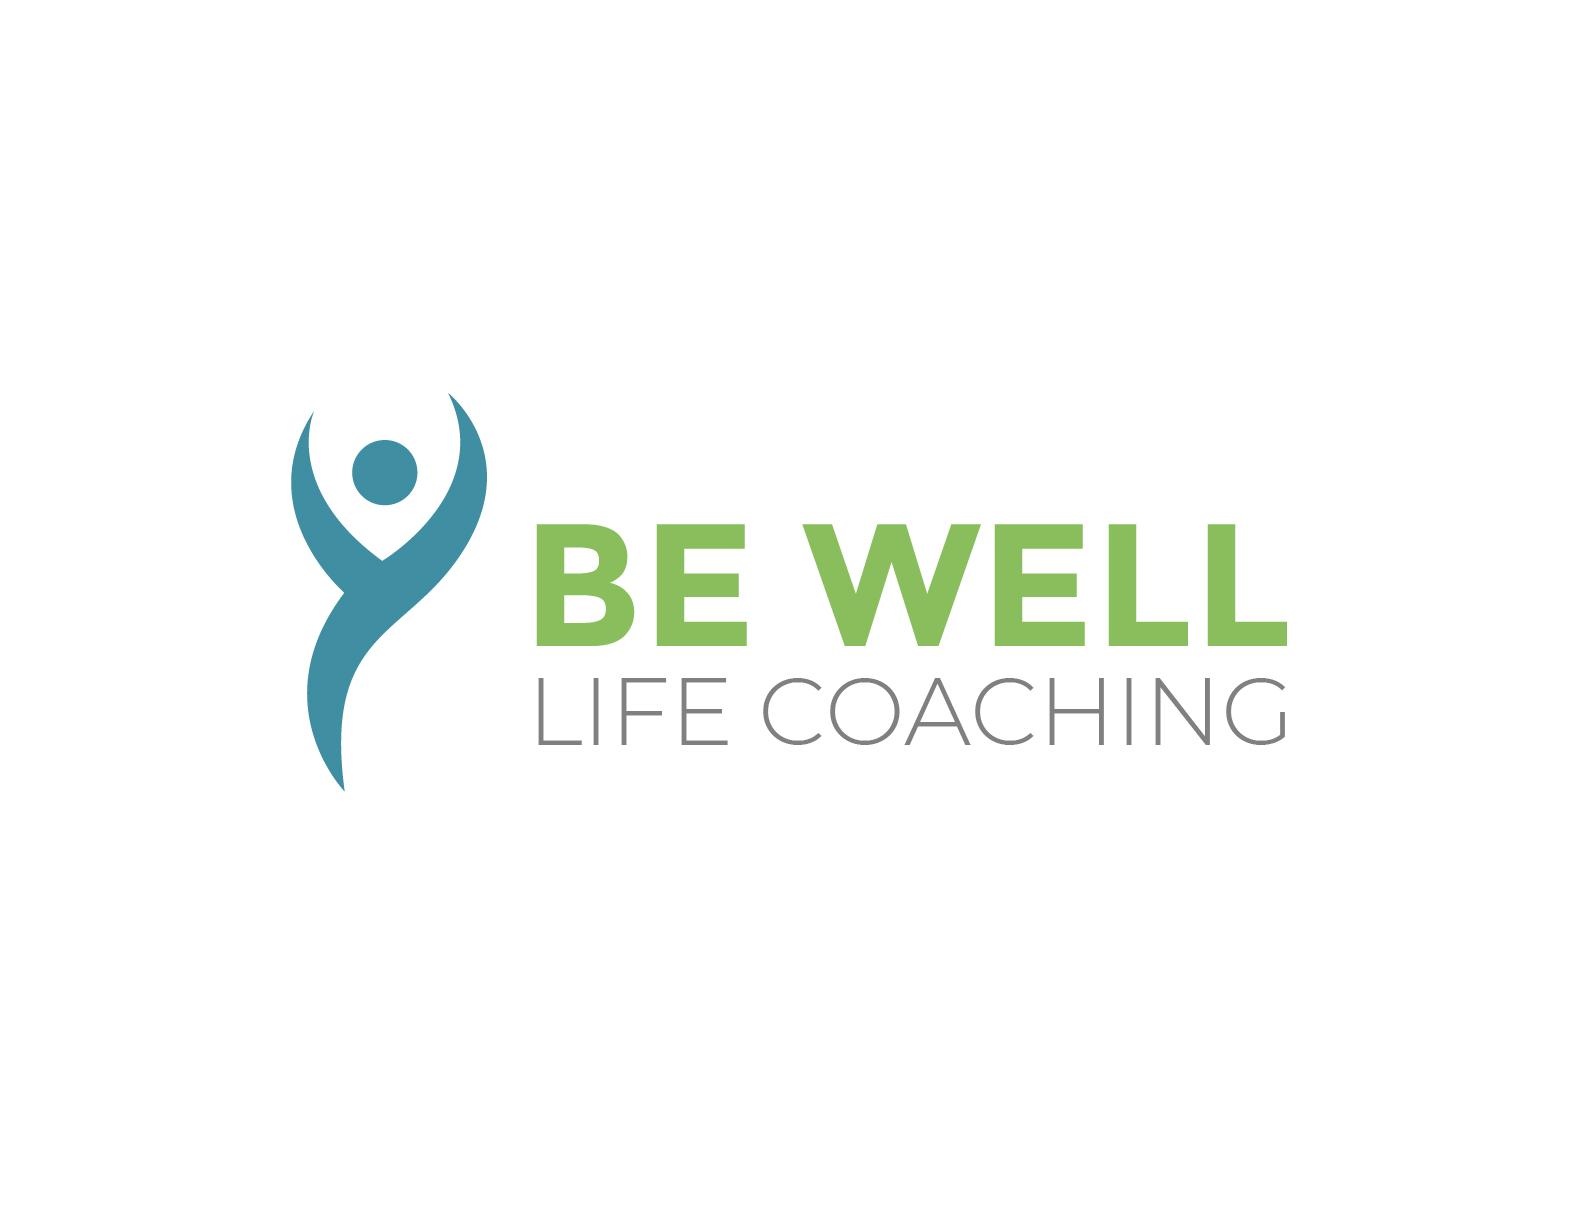 ADHD Coach, Professional Life Coach